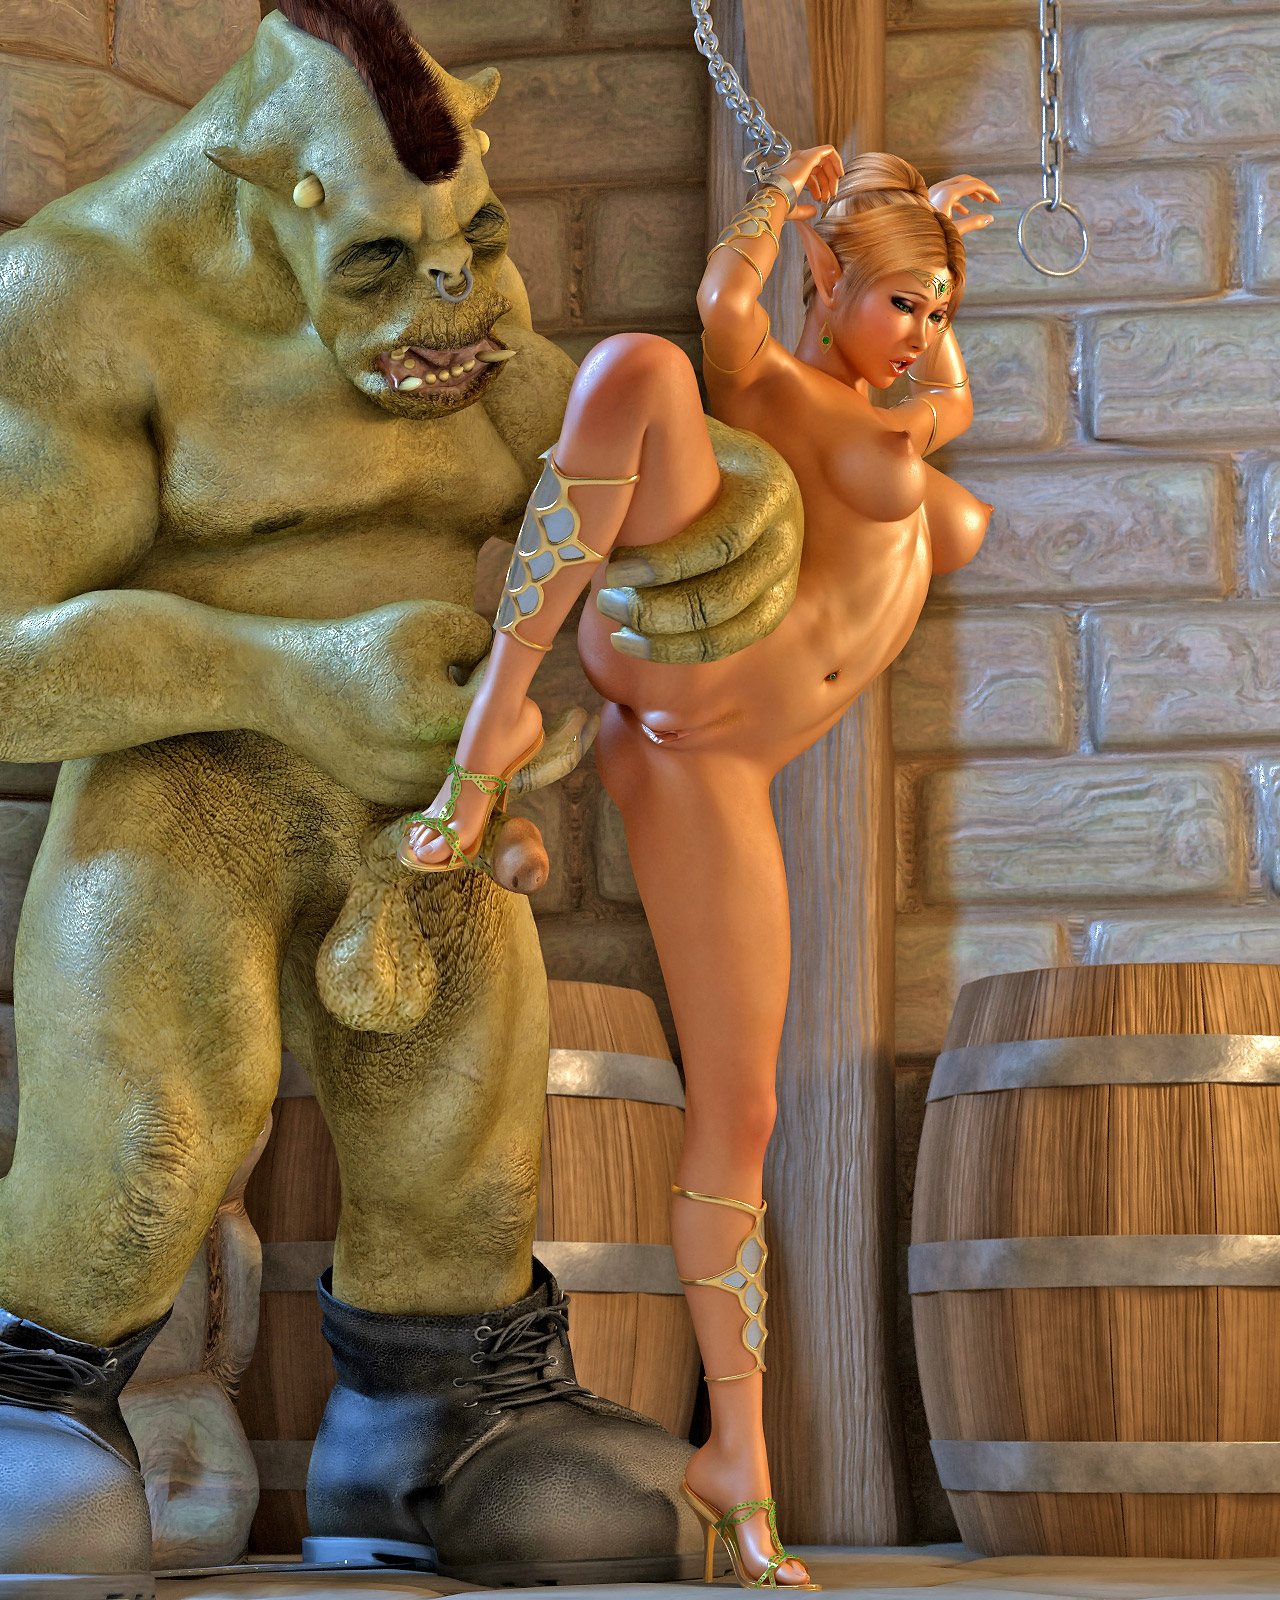 Goblan sex toon cartoon video